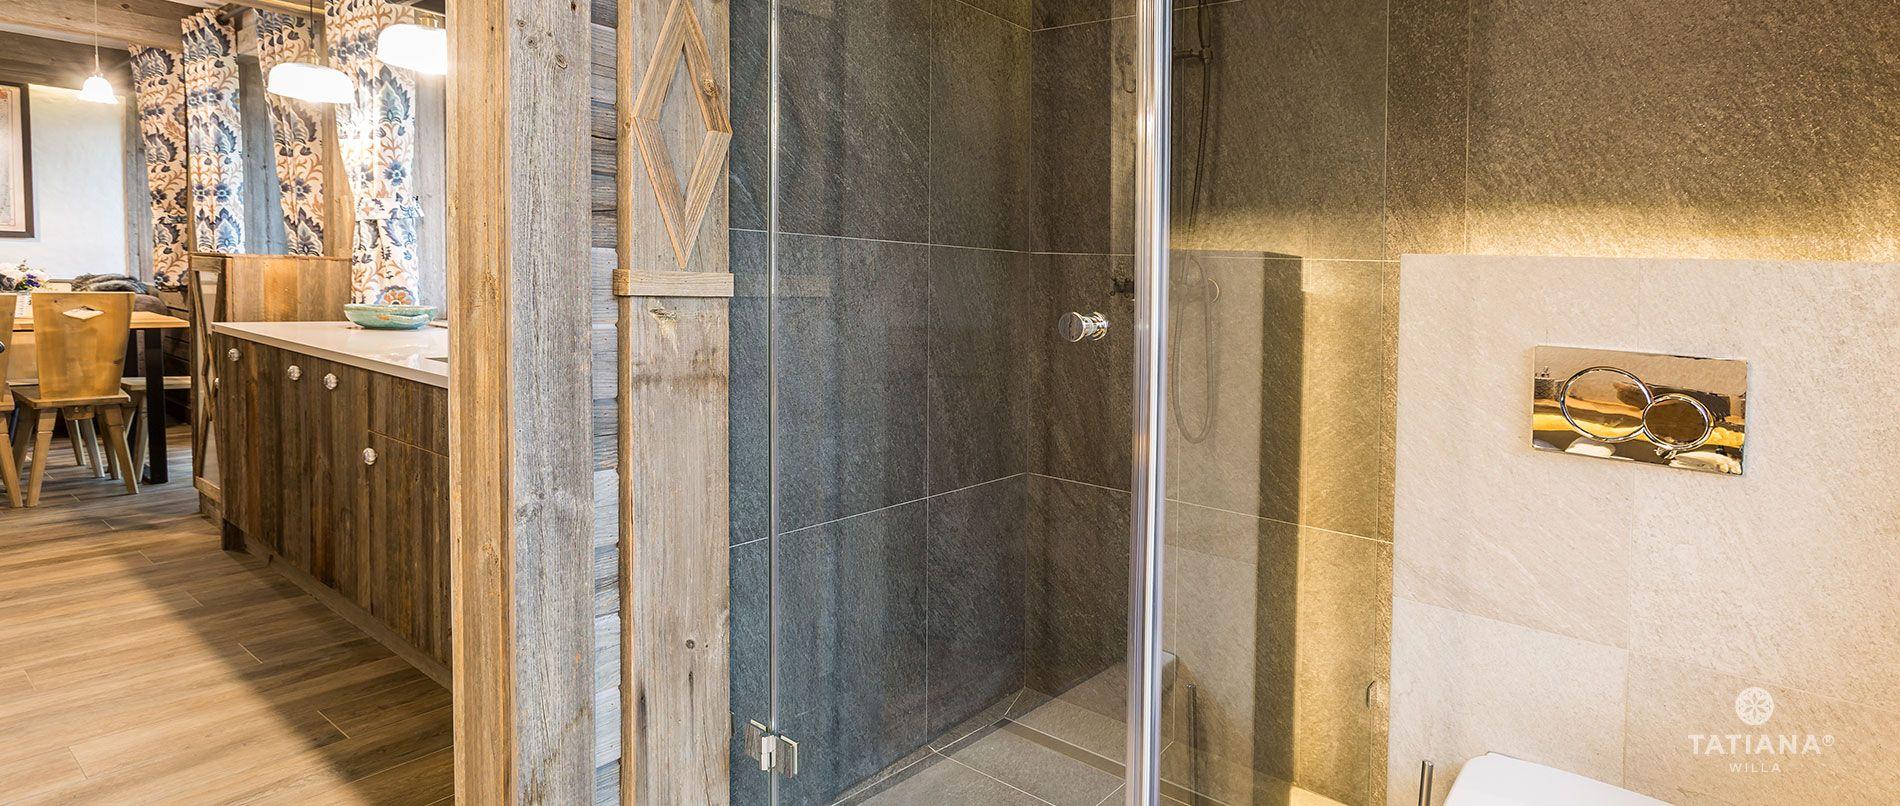 Apartament Syberyjski- łazienka